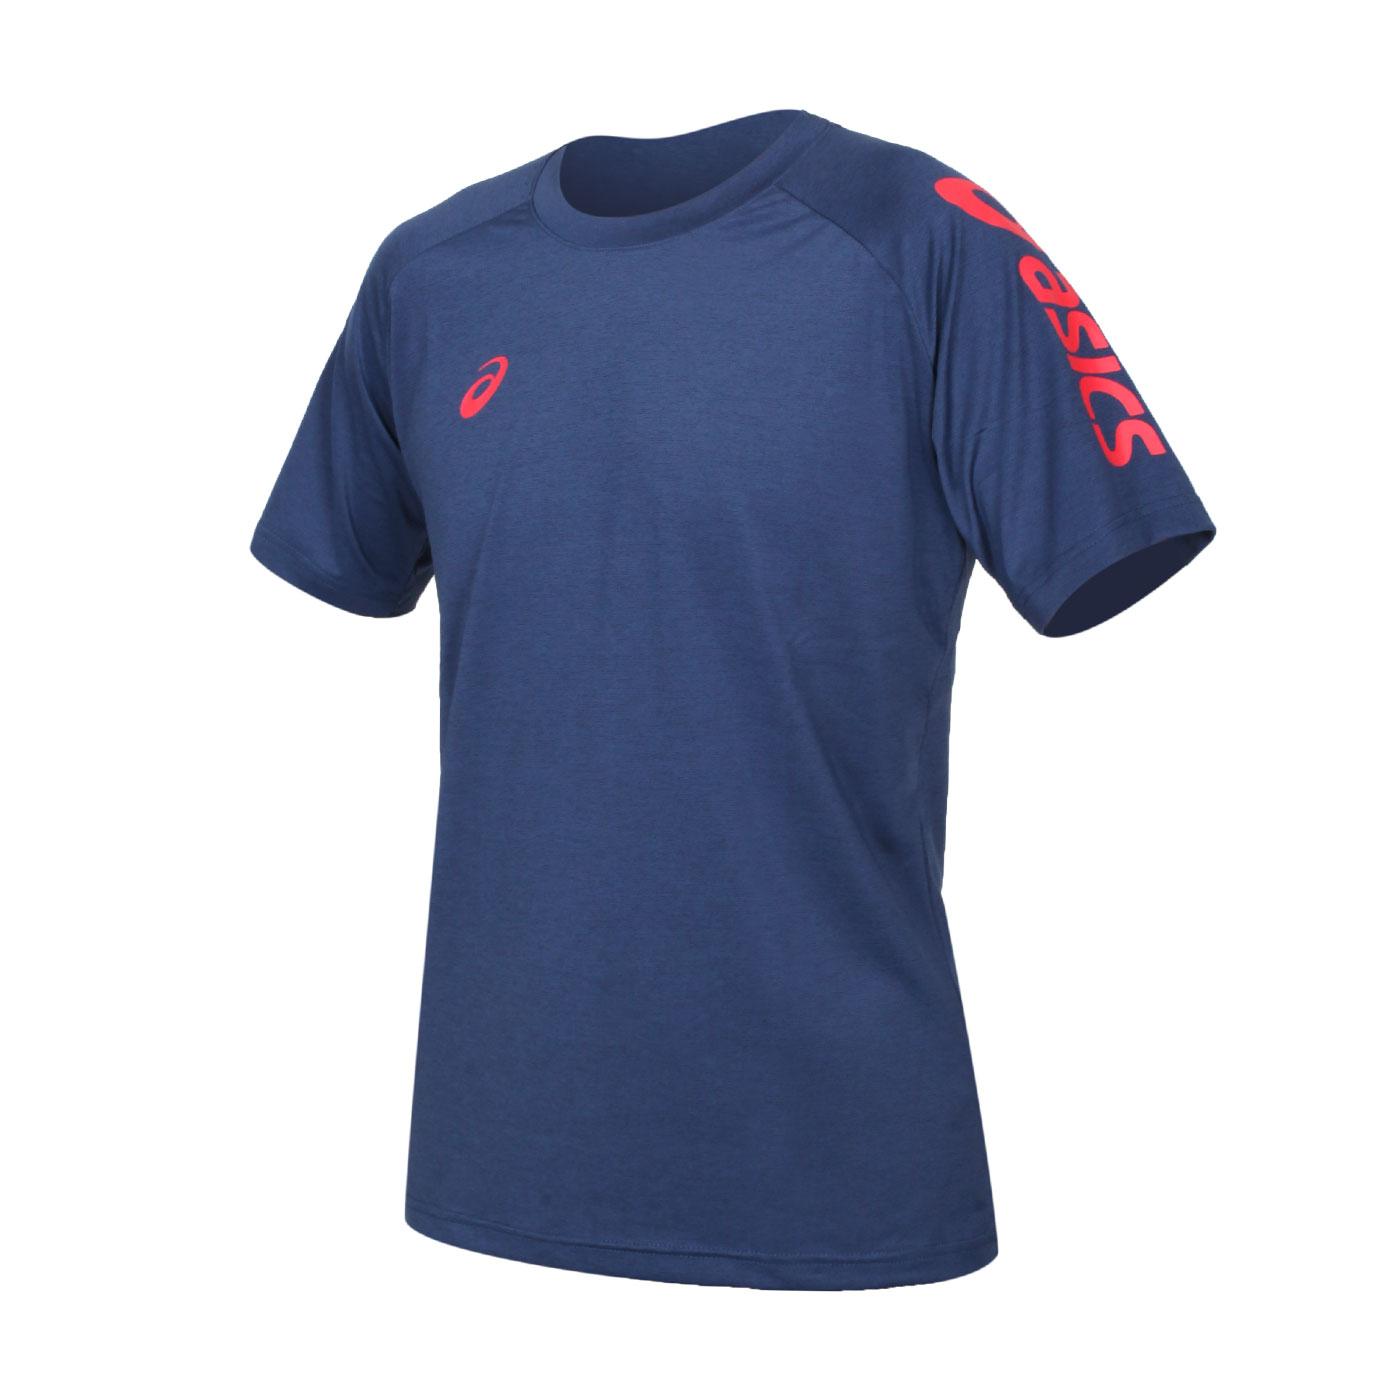 ASICS 男款短袖T恤 K12047-50 - 深藍紅